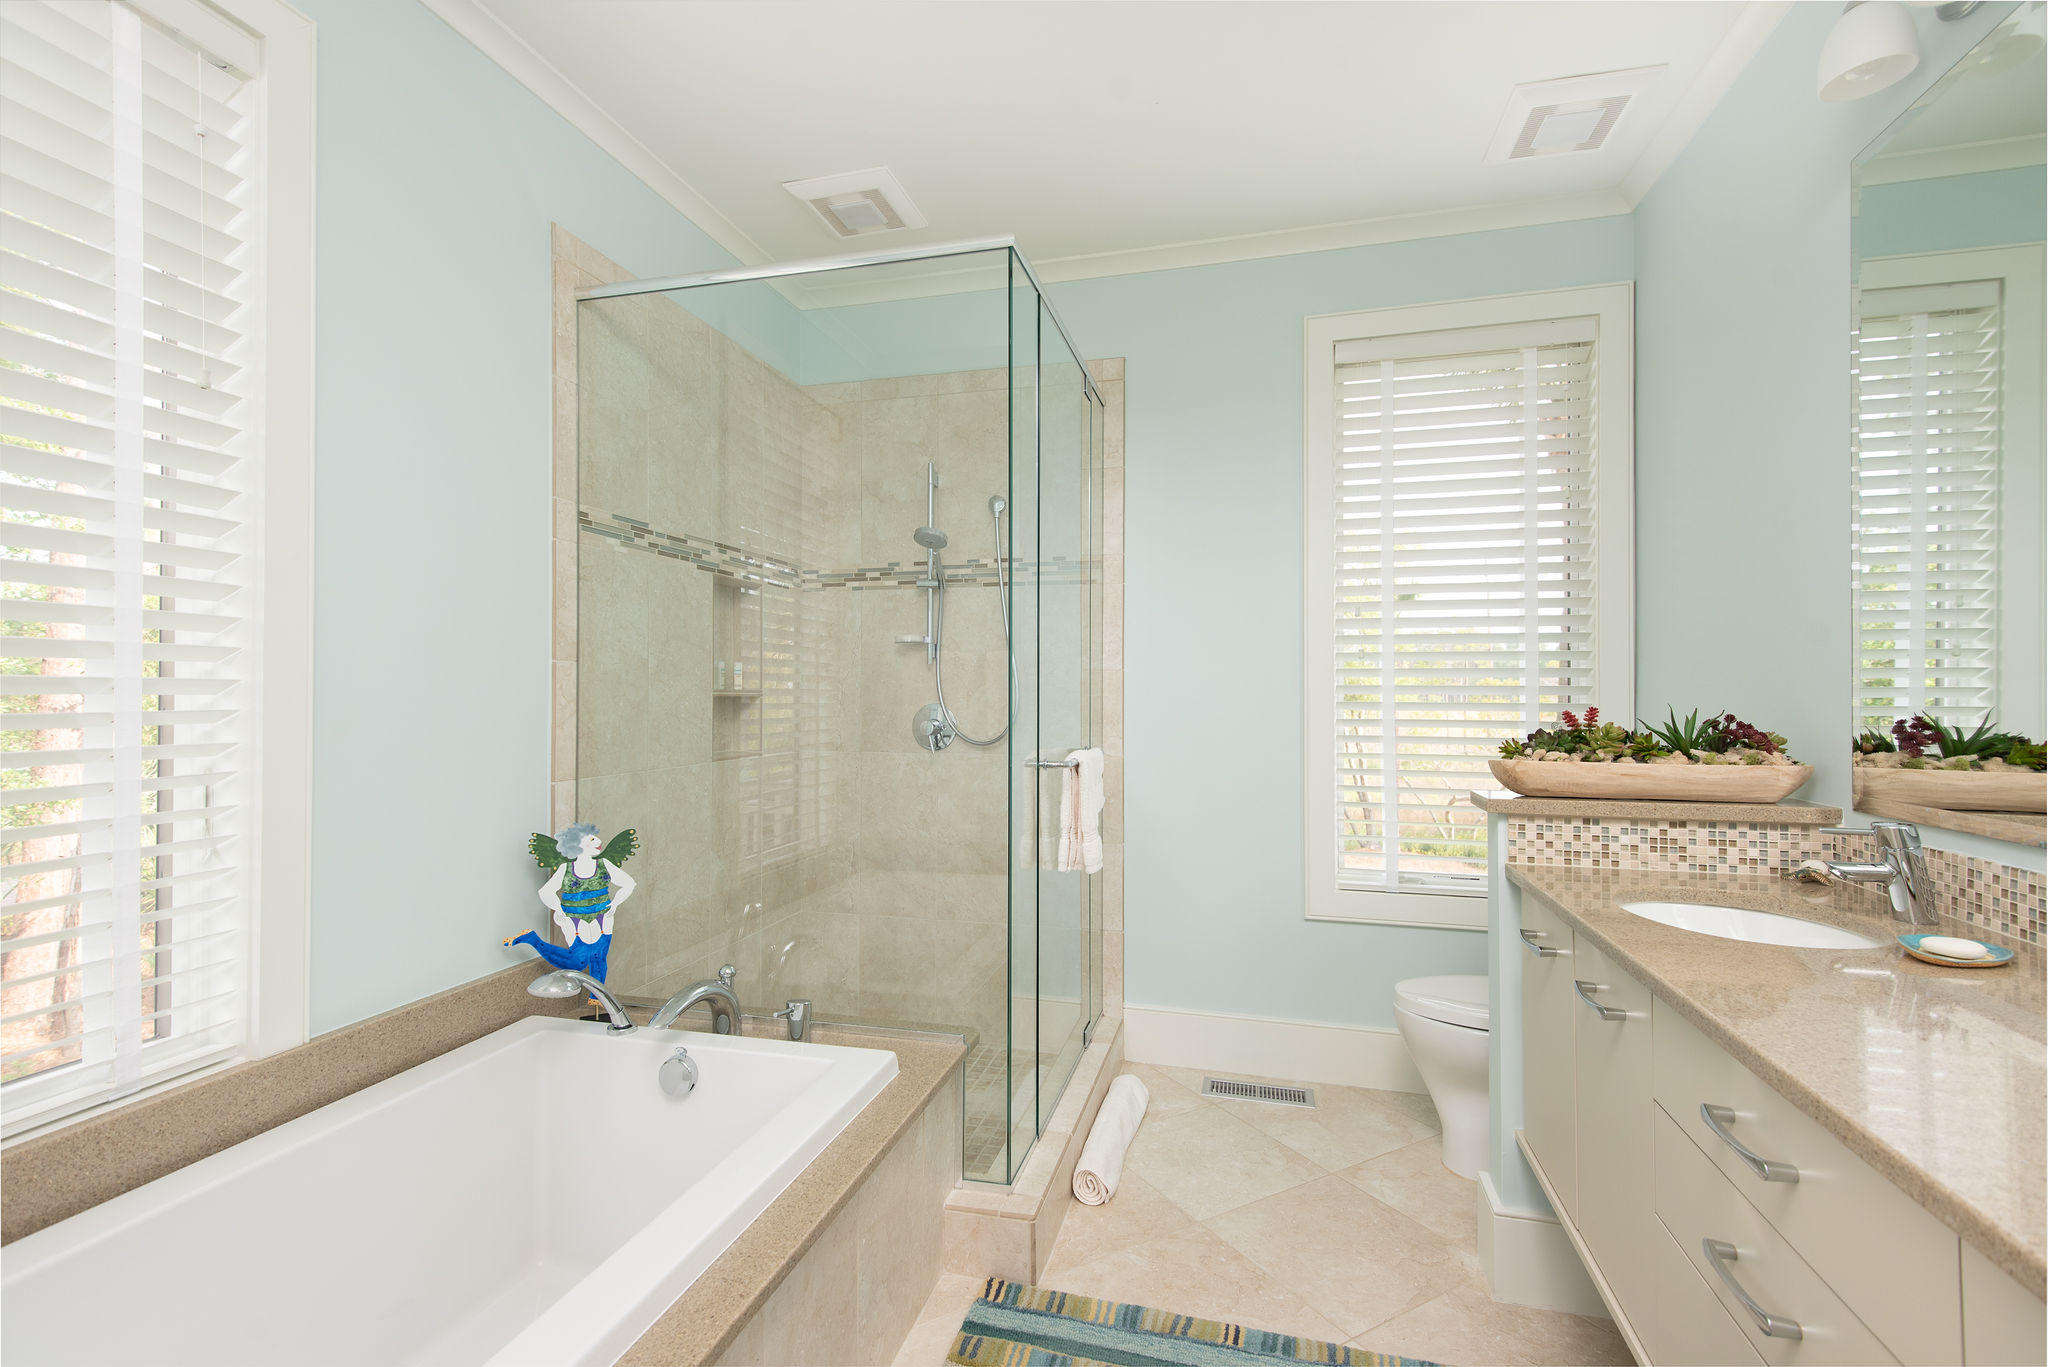 Seabrook Island Homes For Sale - 3135 Marshgate, Seabrook Island, SC - 24